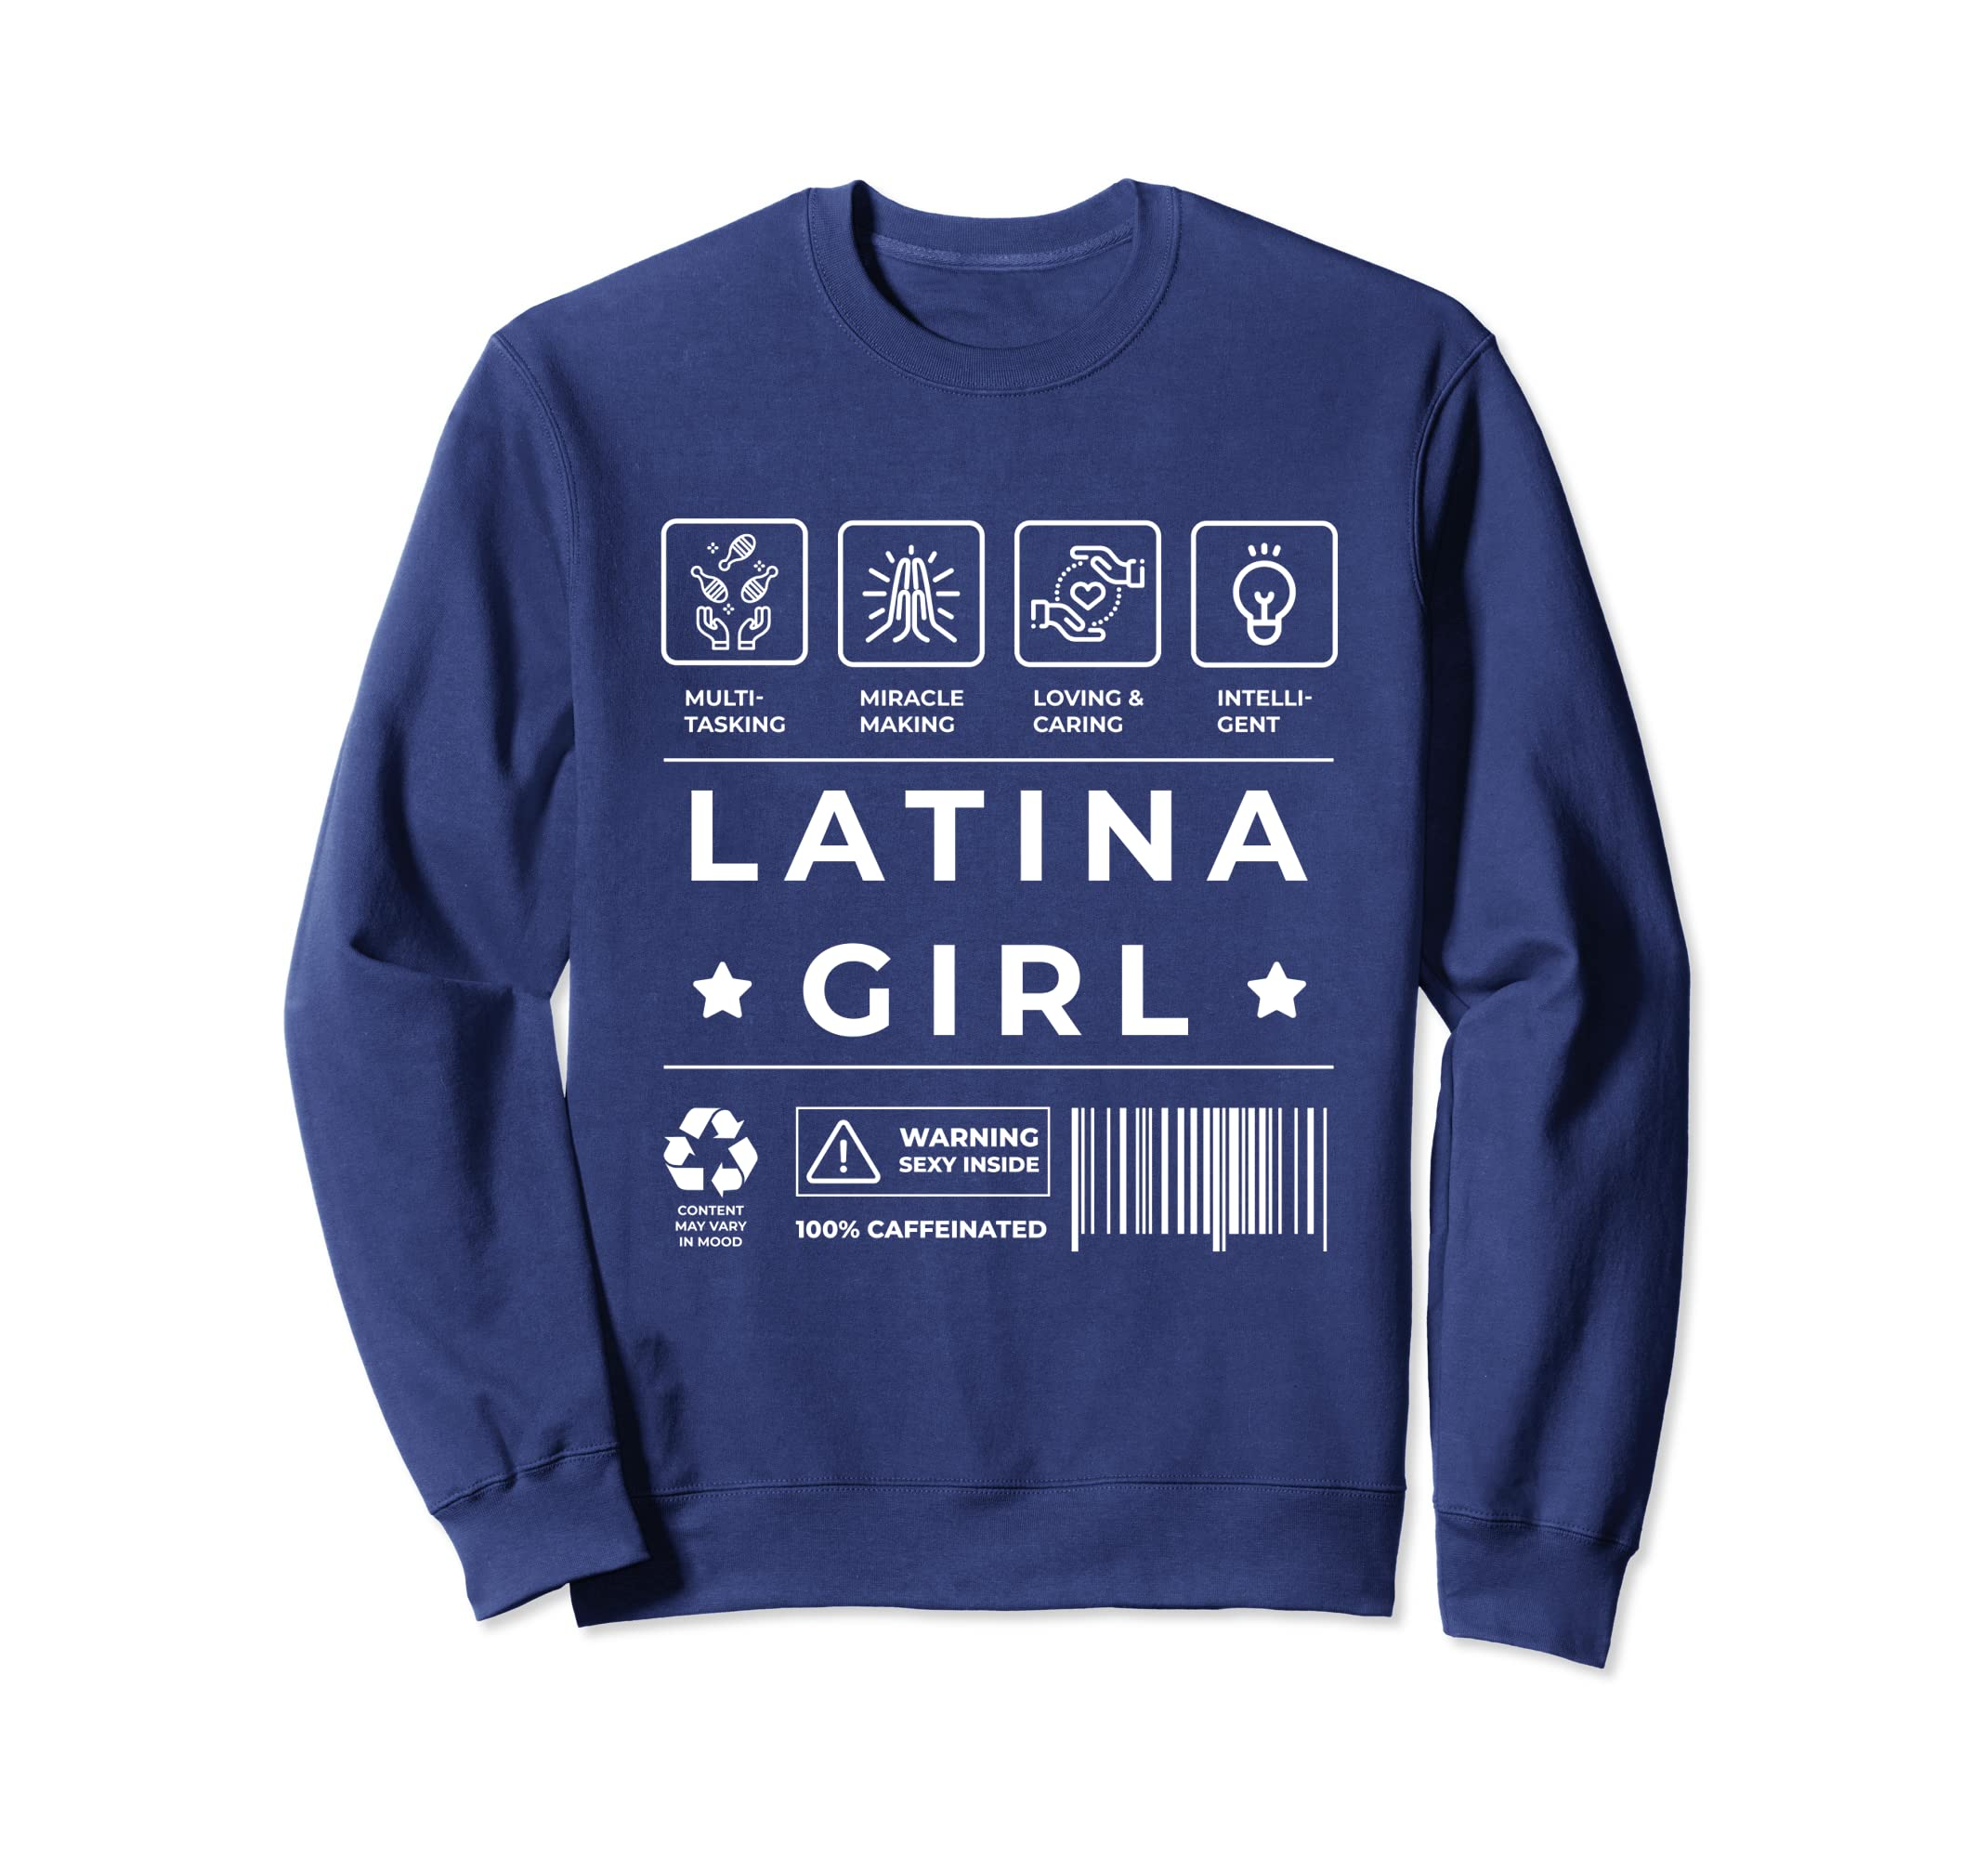 Amazon.com: Latina Power Sweatshirt for Women Sudadera Mujer Latina: Clothing